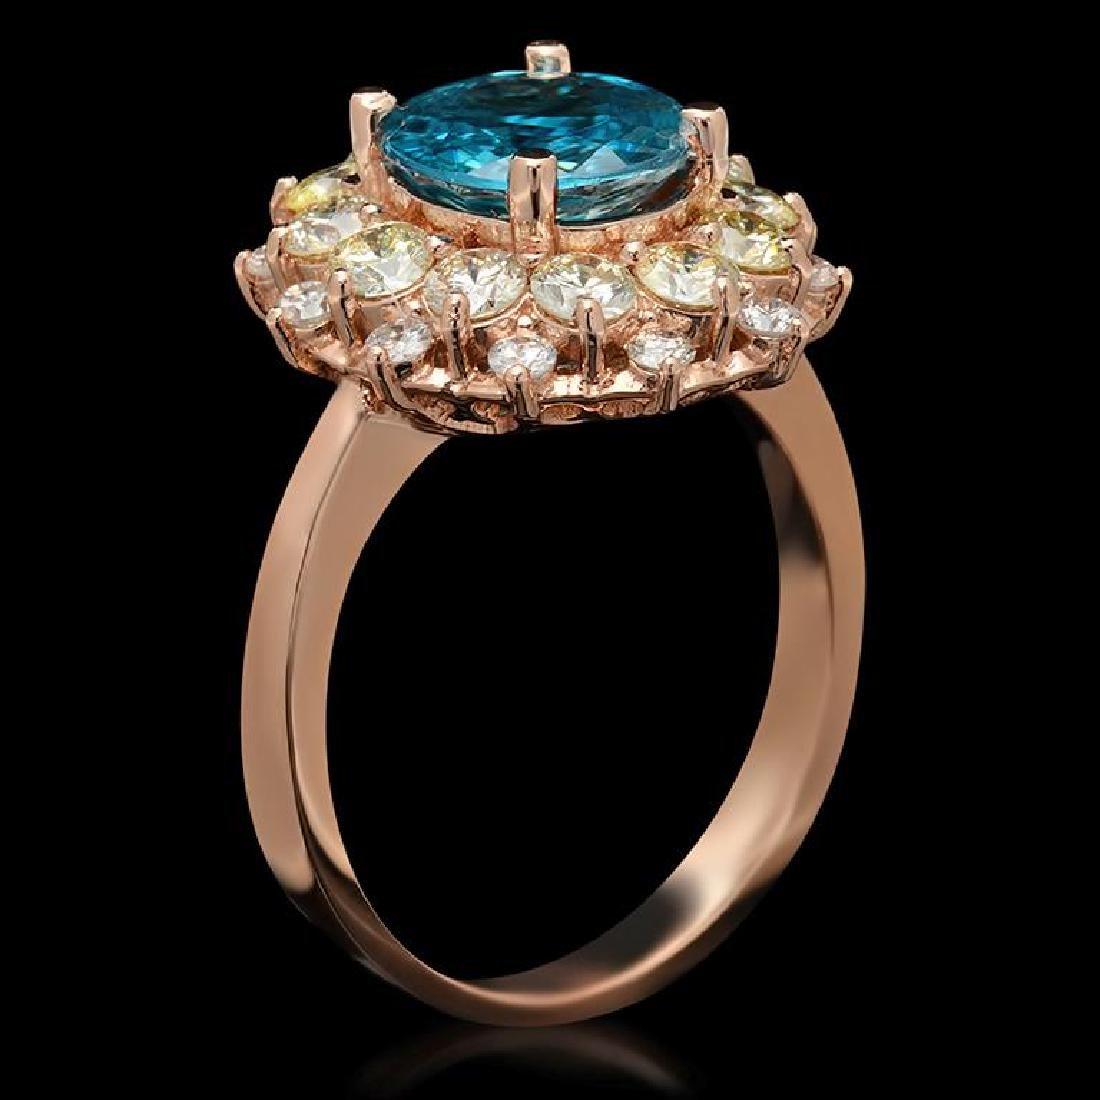 14k Gold 3.07ct Zircon & 1.51ct Diamond Ring - 2